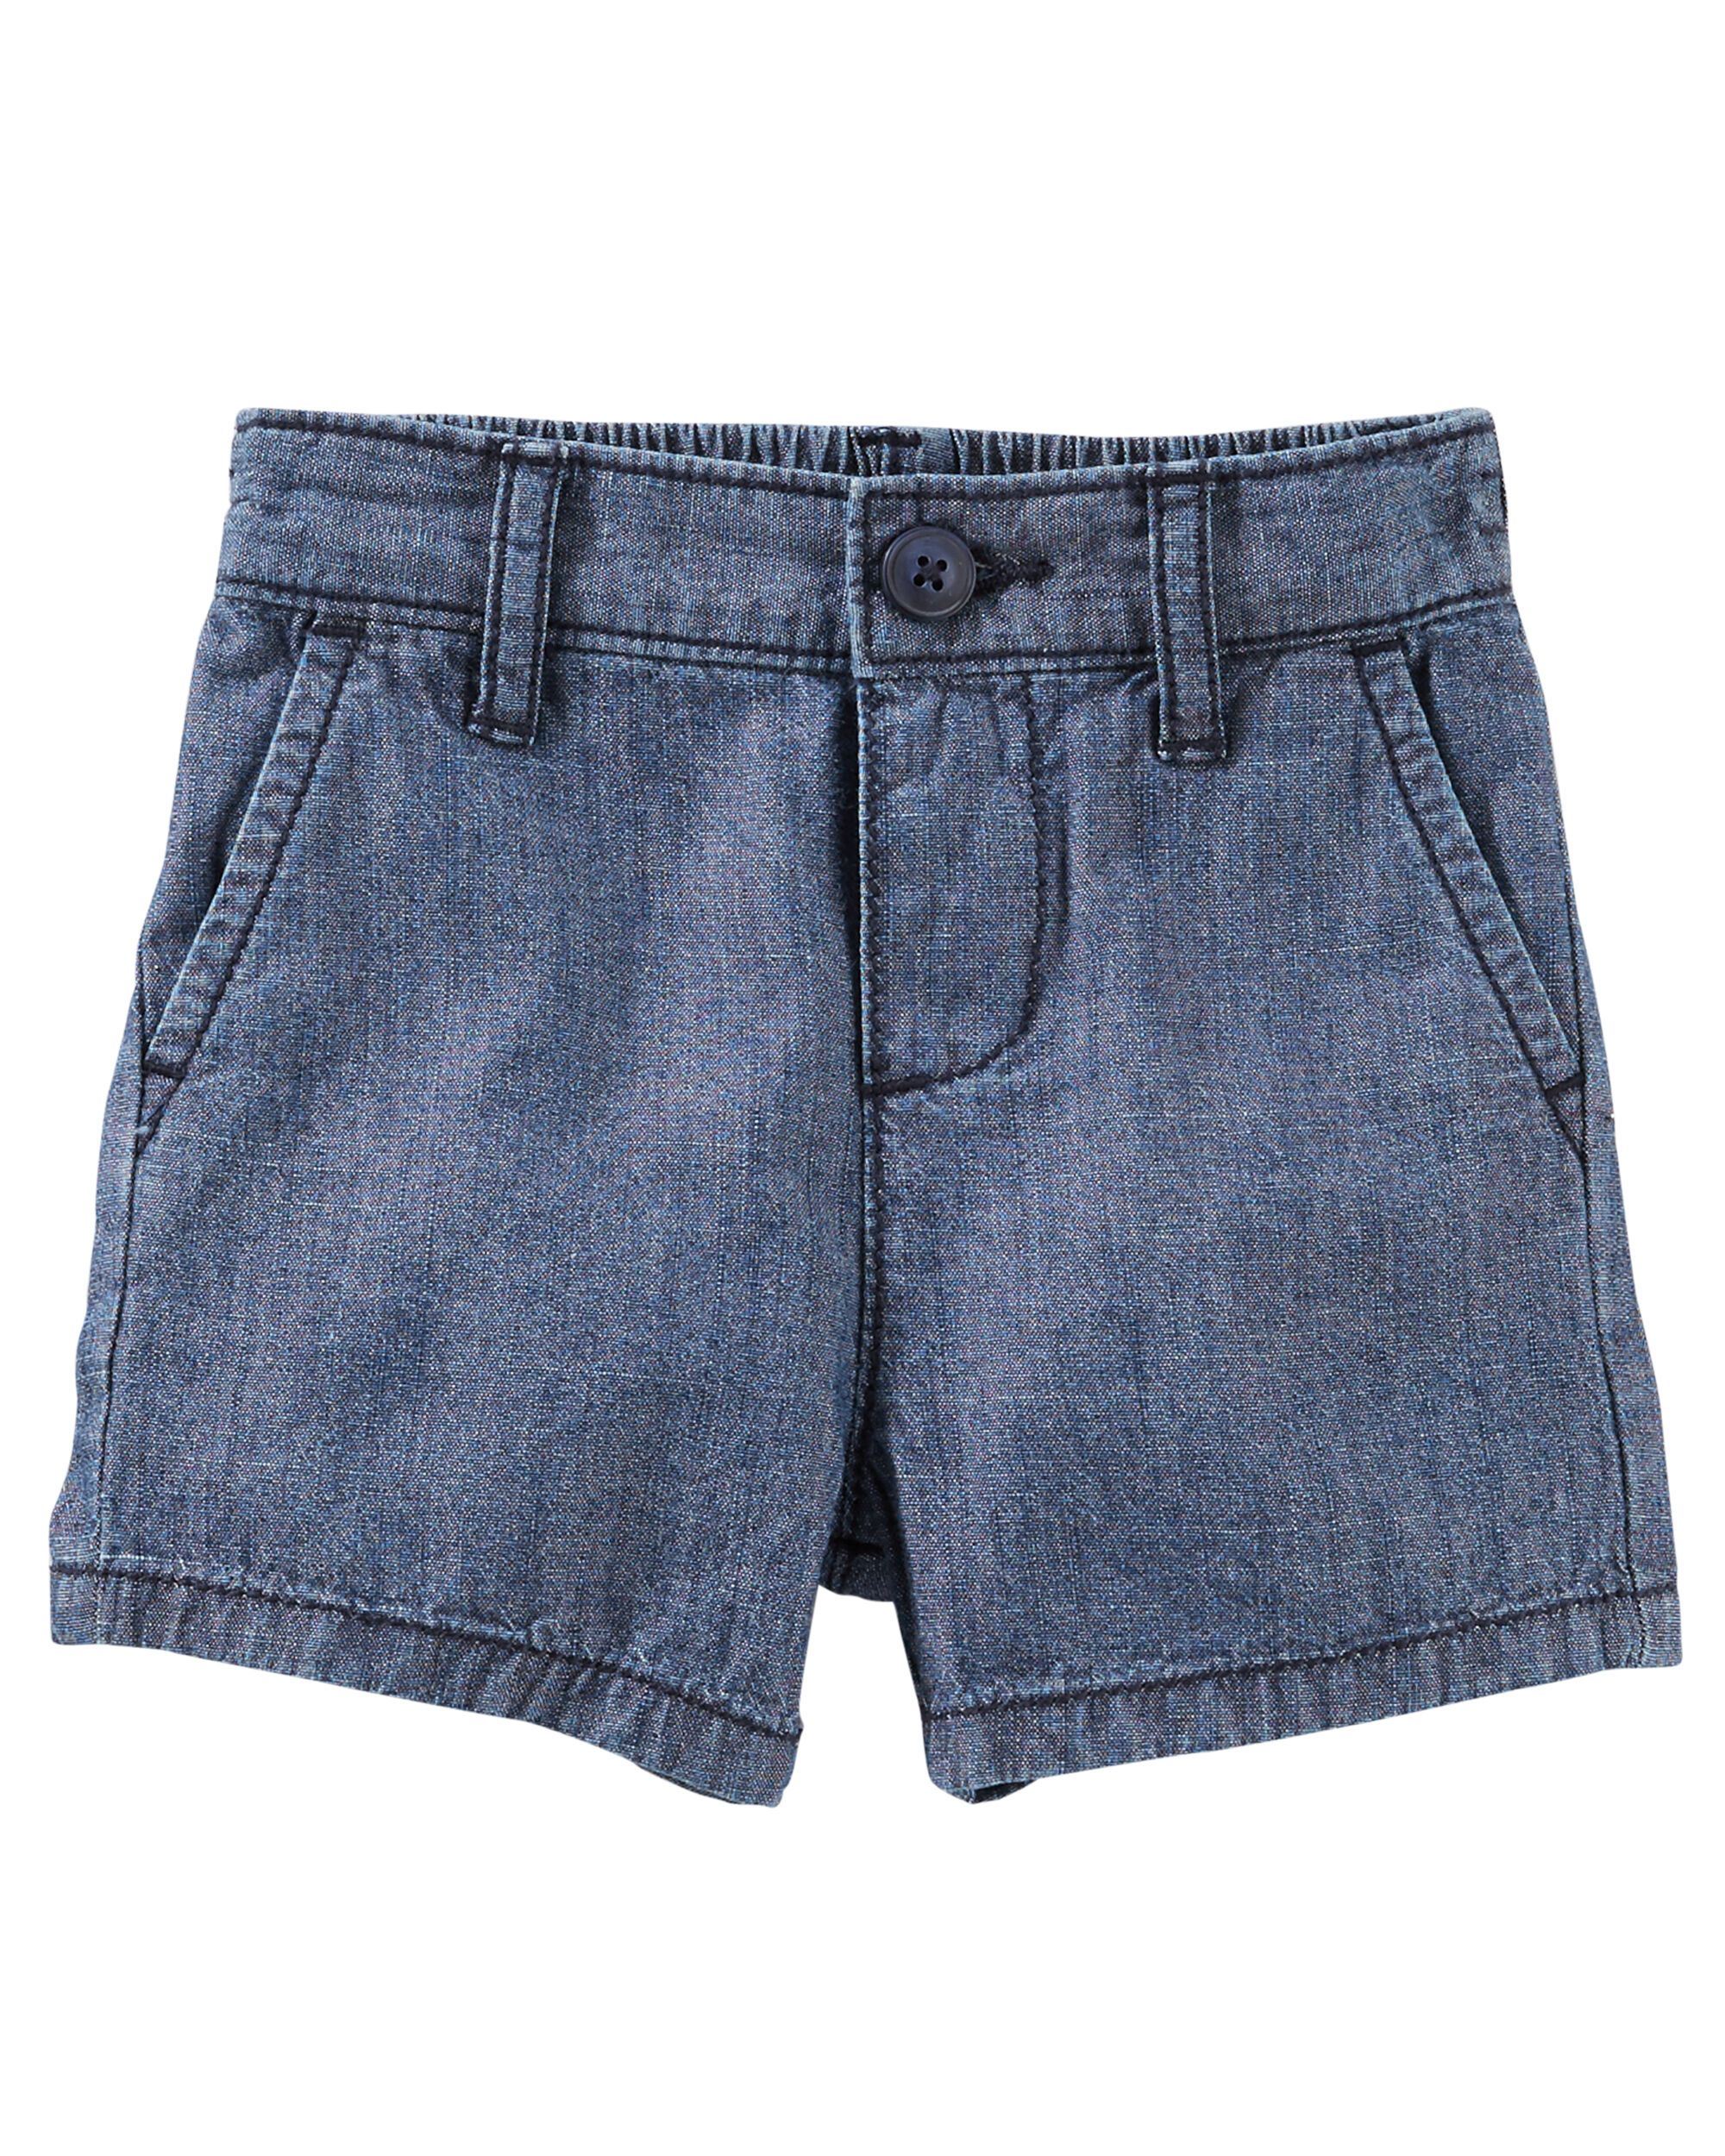 Chambray Uniform Shorts